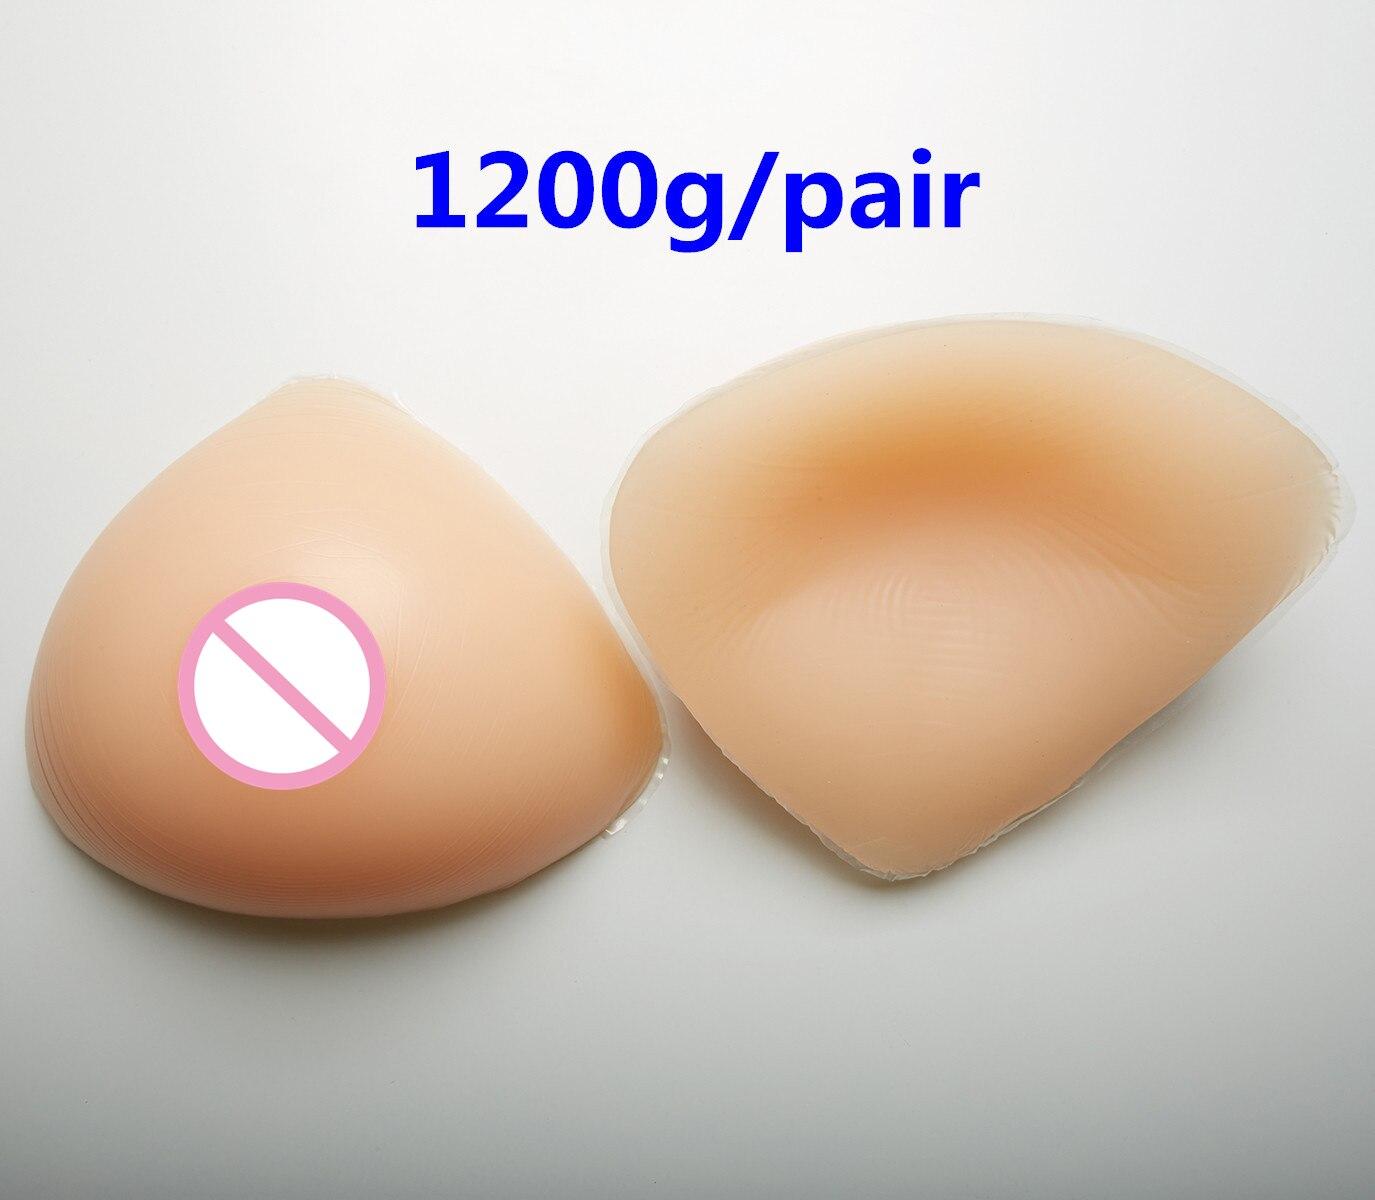 1200 g/paire seins artificiels Silicone faux seins mammaires mastectomie forme mammaire faux seins pour Crossdresser1200 g/paire seins artificiels Silicone faux seins mammaires mastectomie forme mammaire faux seins pour Crossdresser